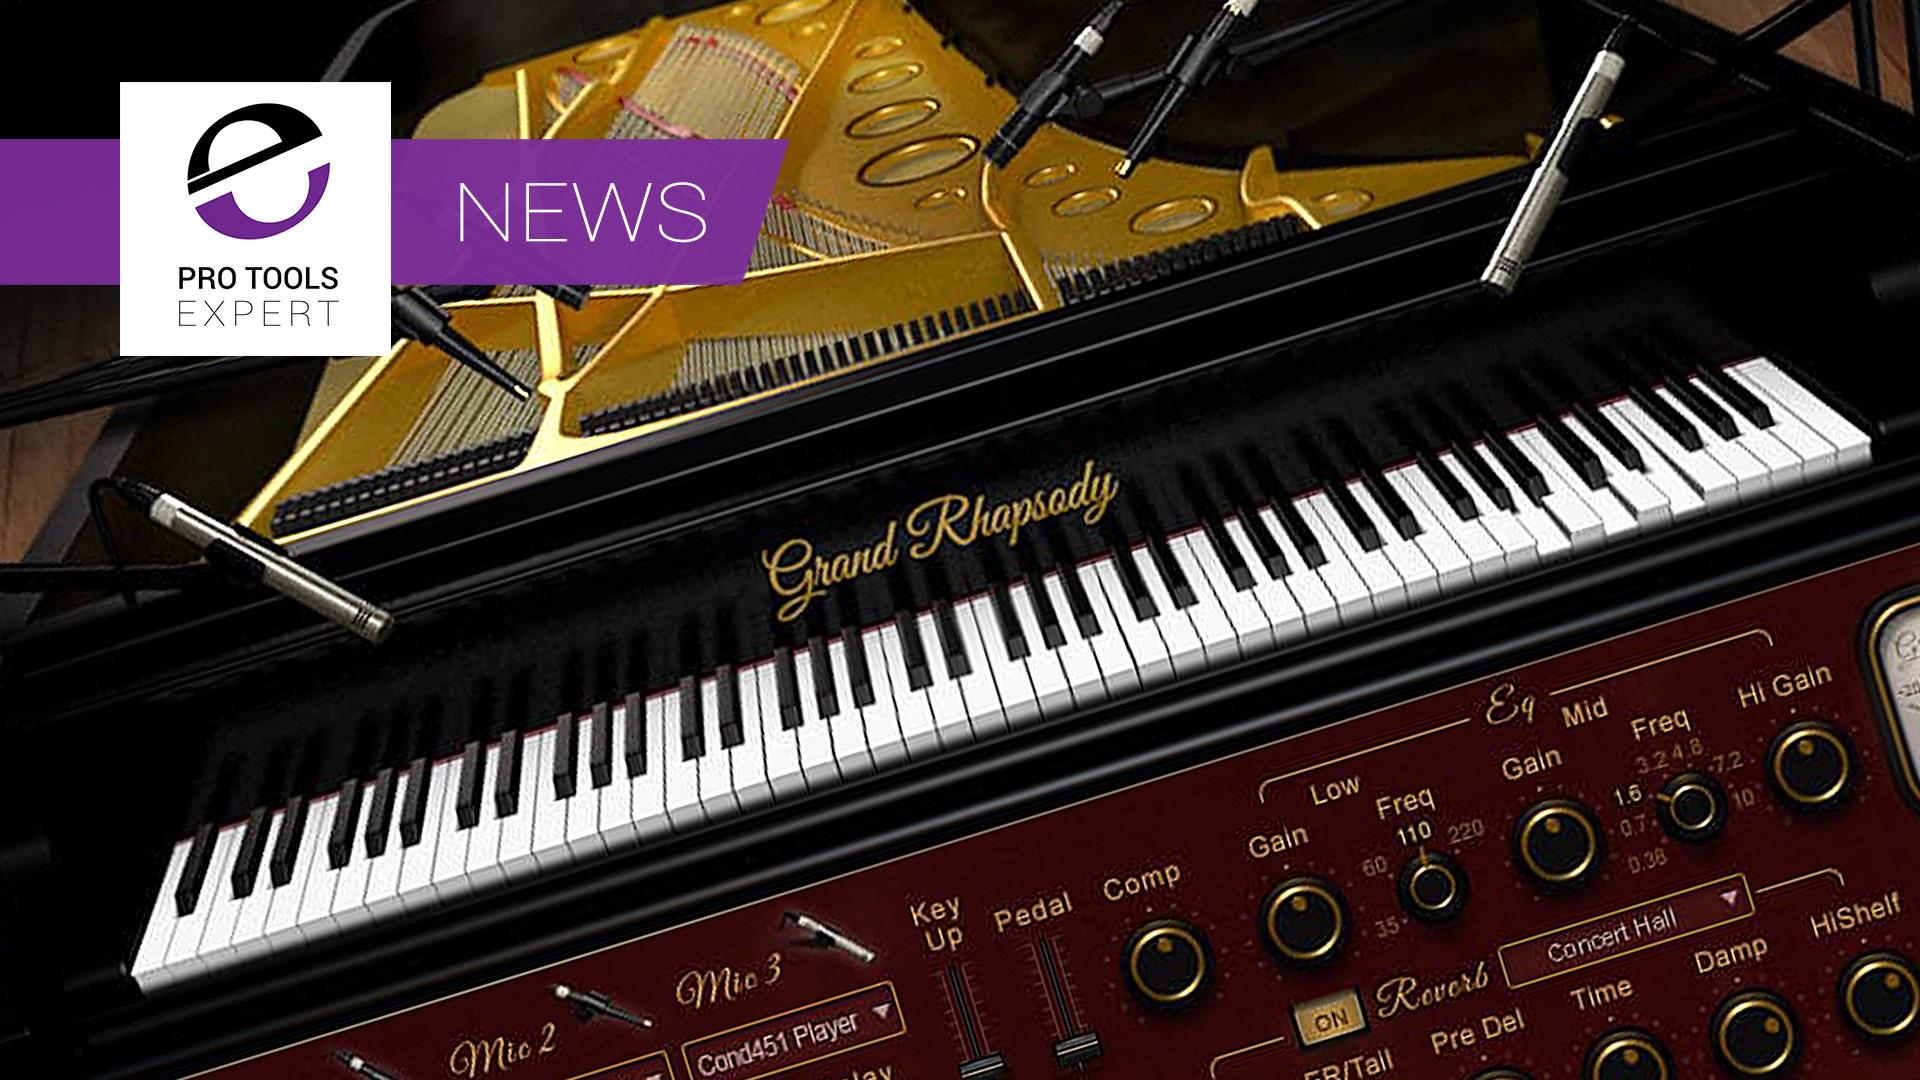 waves-grand-rhapsody-piano-virtual-instrument.jpg